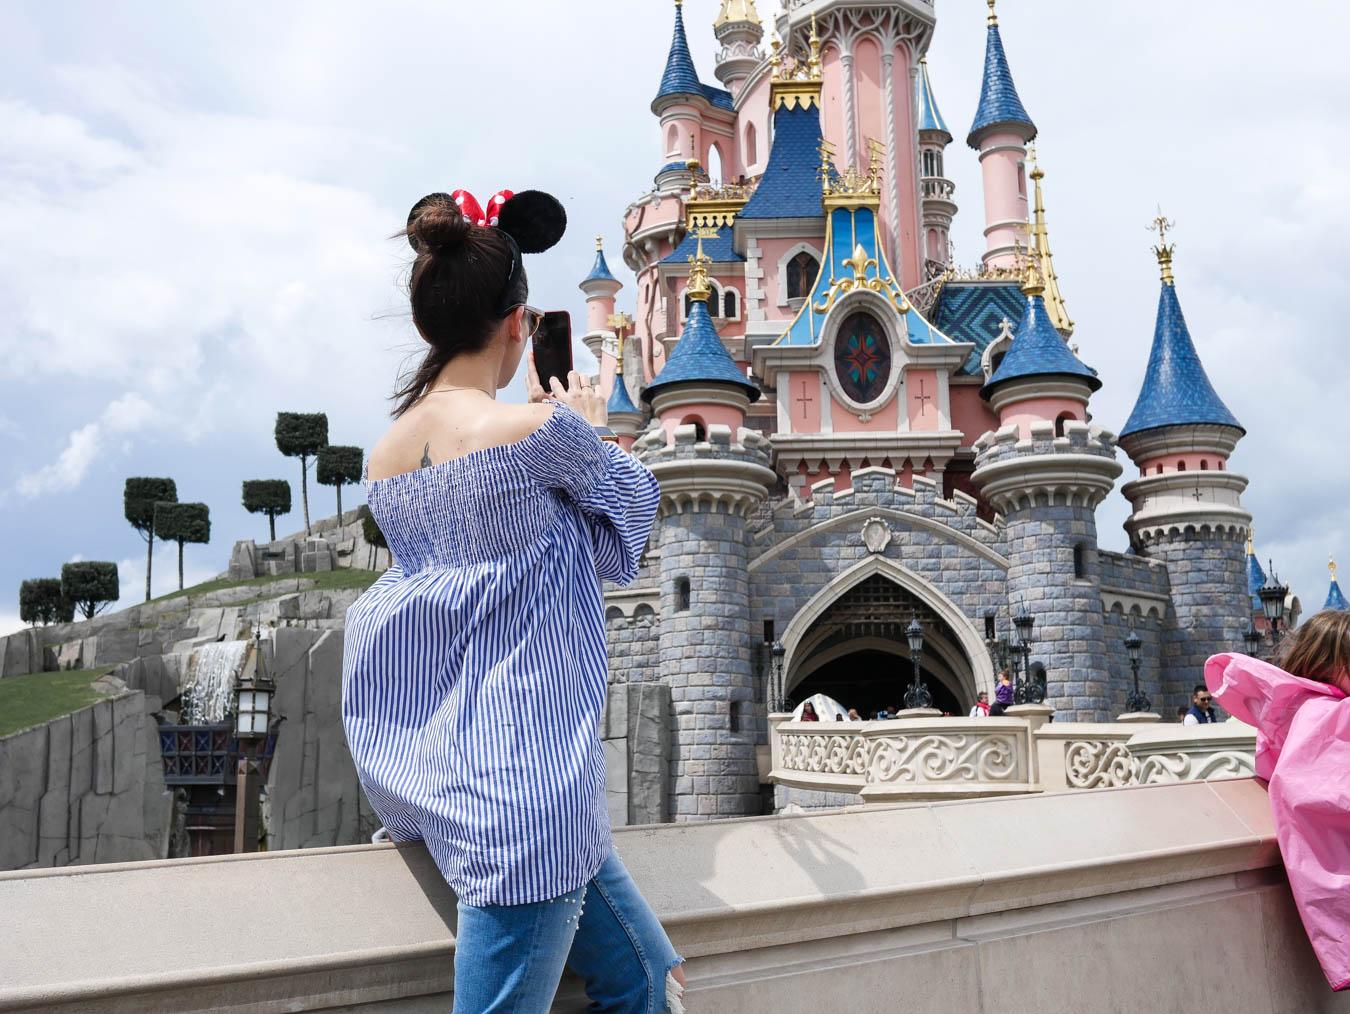 Travel | Kurztrip nach Paris & ins Disneyland Paris (mit Kindern).